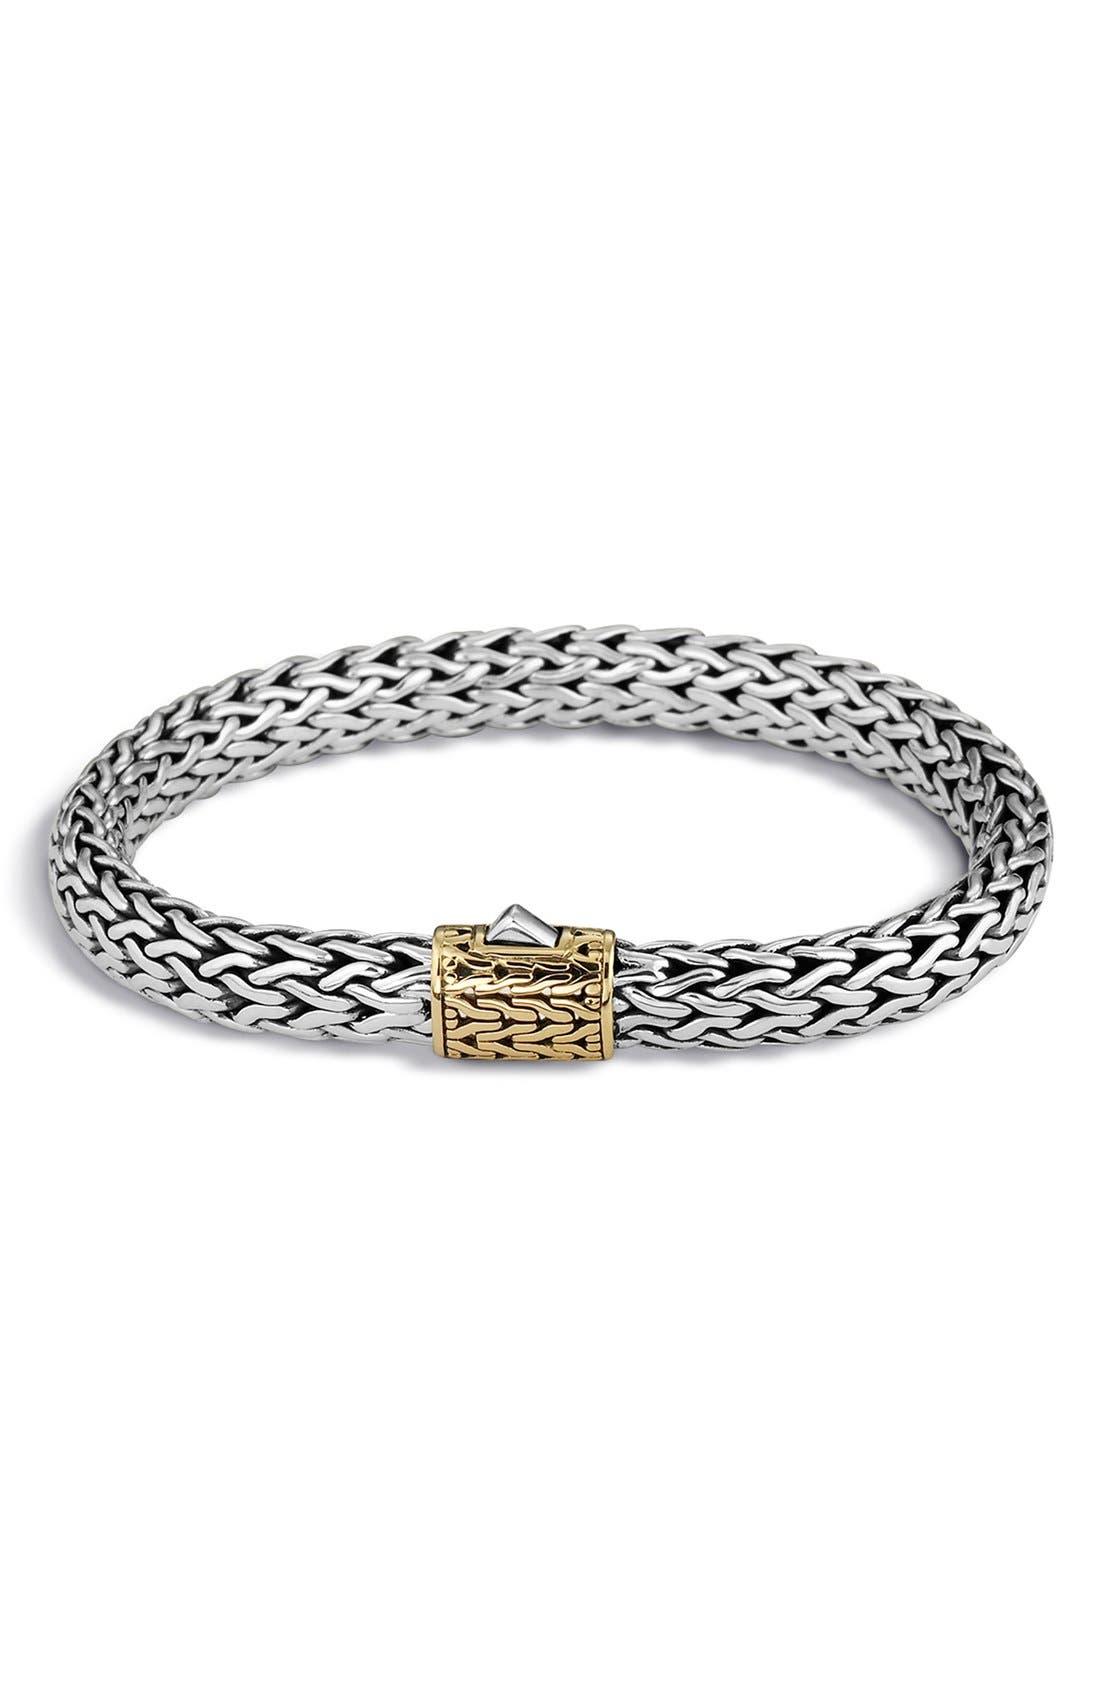 Main Image - John Hardy 'Classic Chain' Medium Bracelet